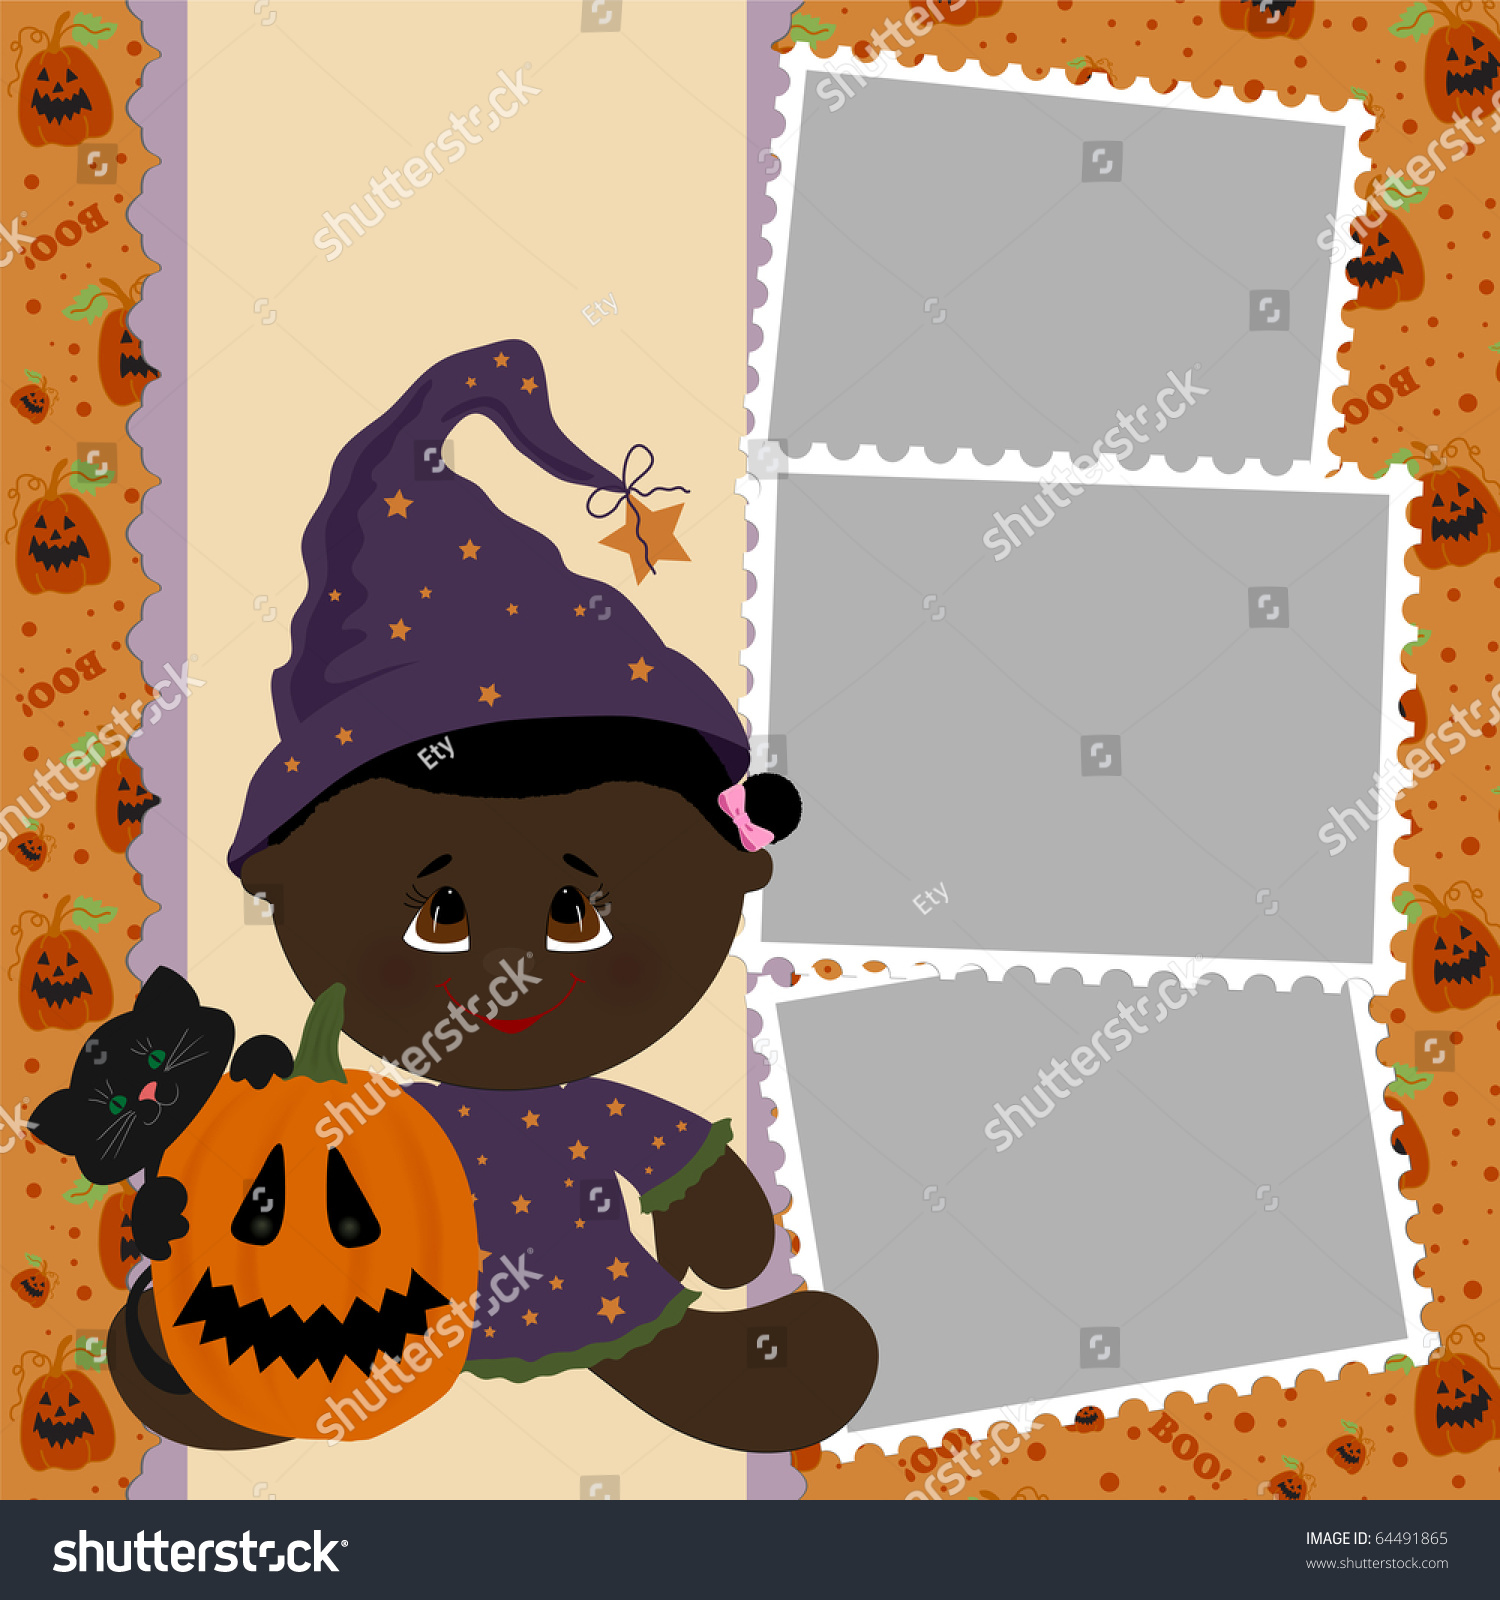 Blank Photo Post Card With Frame Stock Photo Image Kotaksurat